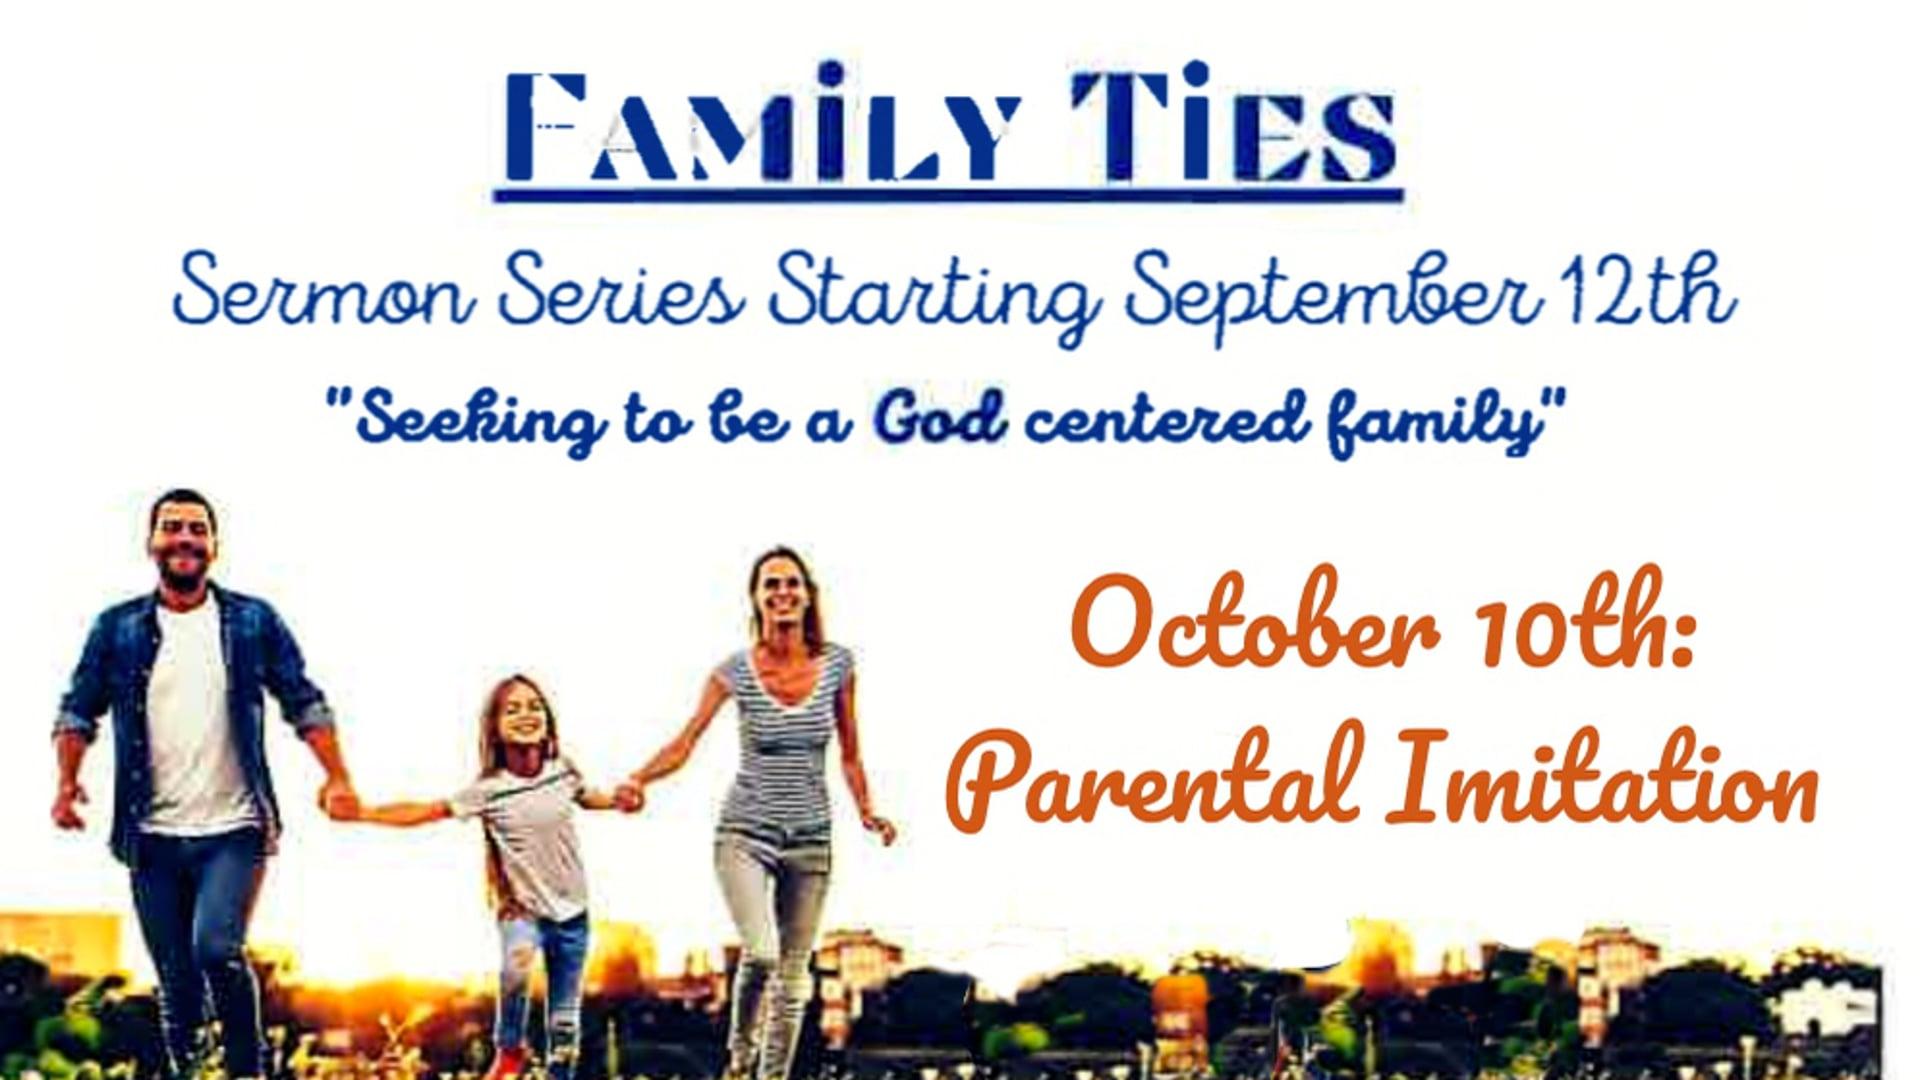 Royston Baptist Church 11 AM Worship Service Message for Oct. 10, 2021